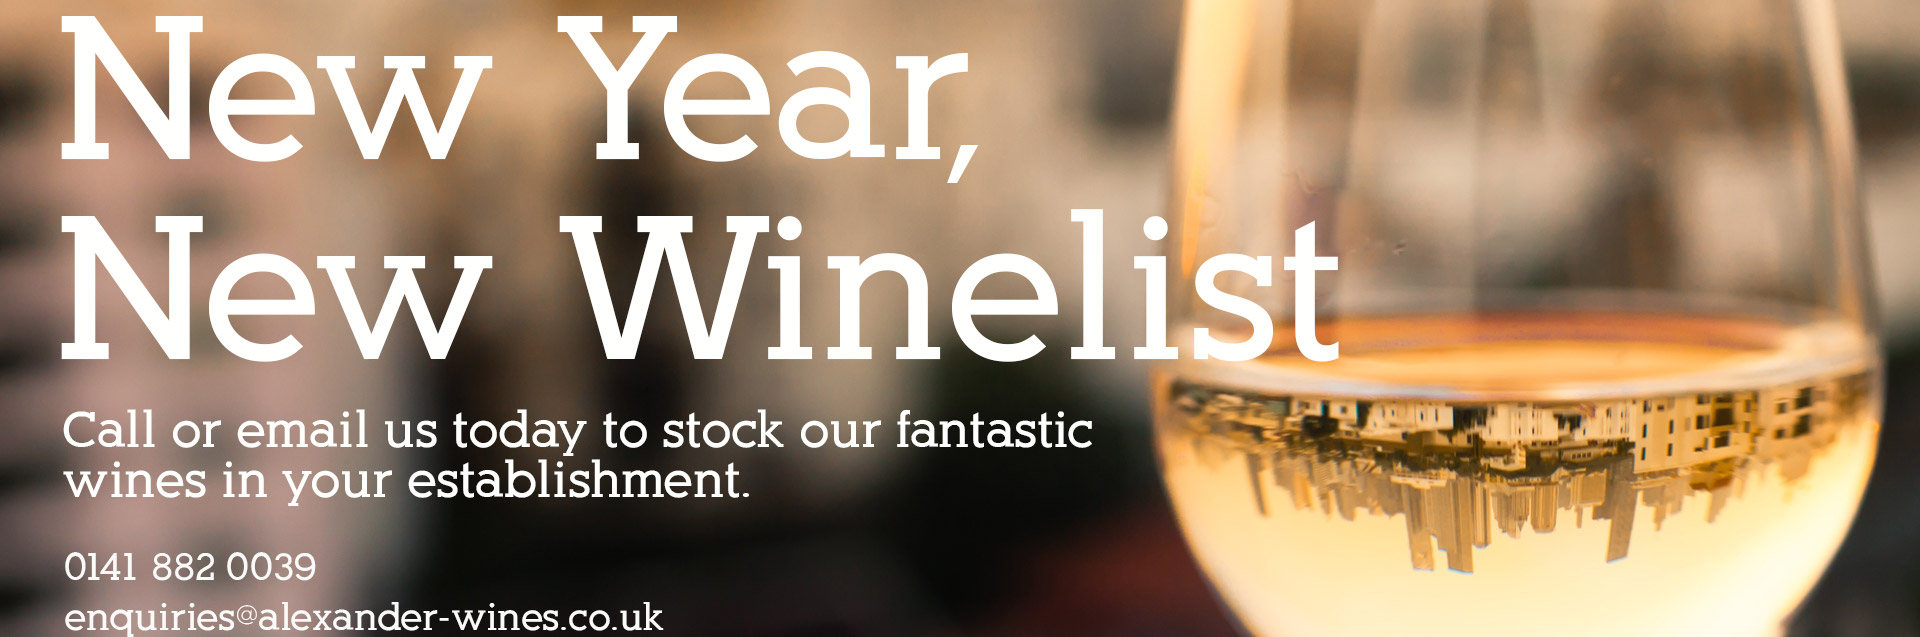 New Year, New winelist